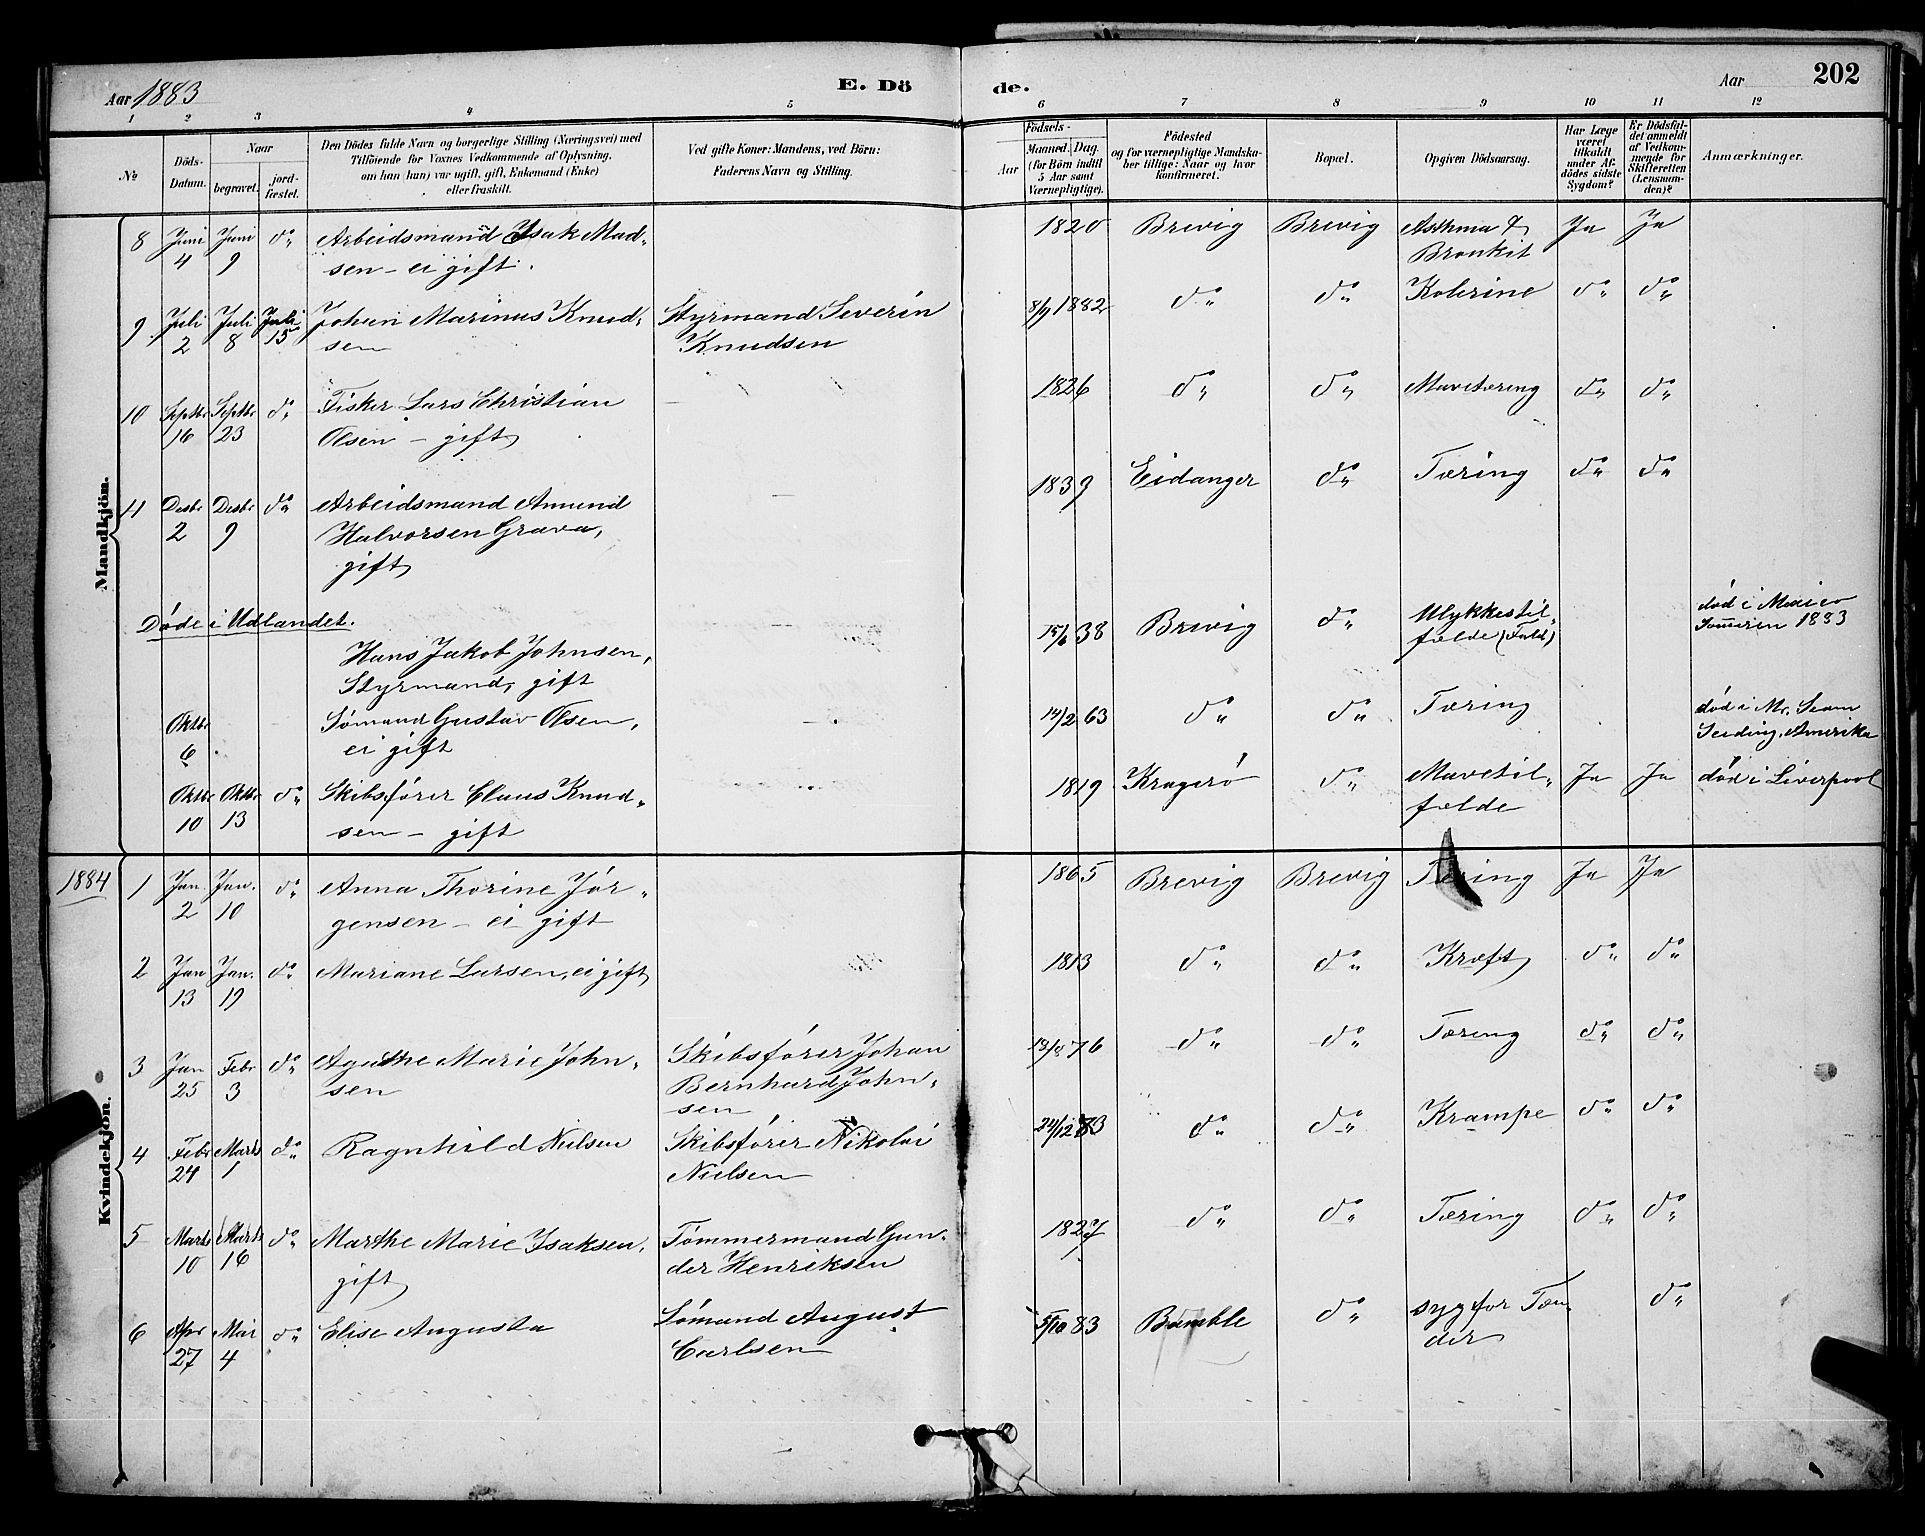 SAKO, Brevik kirkebøker, G/Ga/L0004: Klokkerbok nr. 4, 1882-1900, s. 202